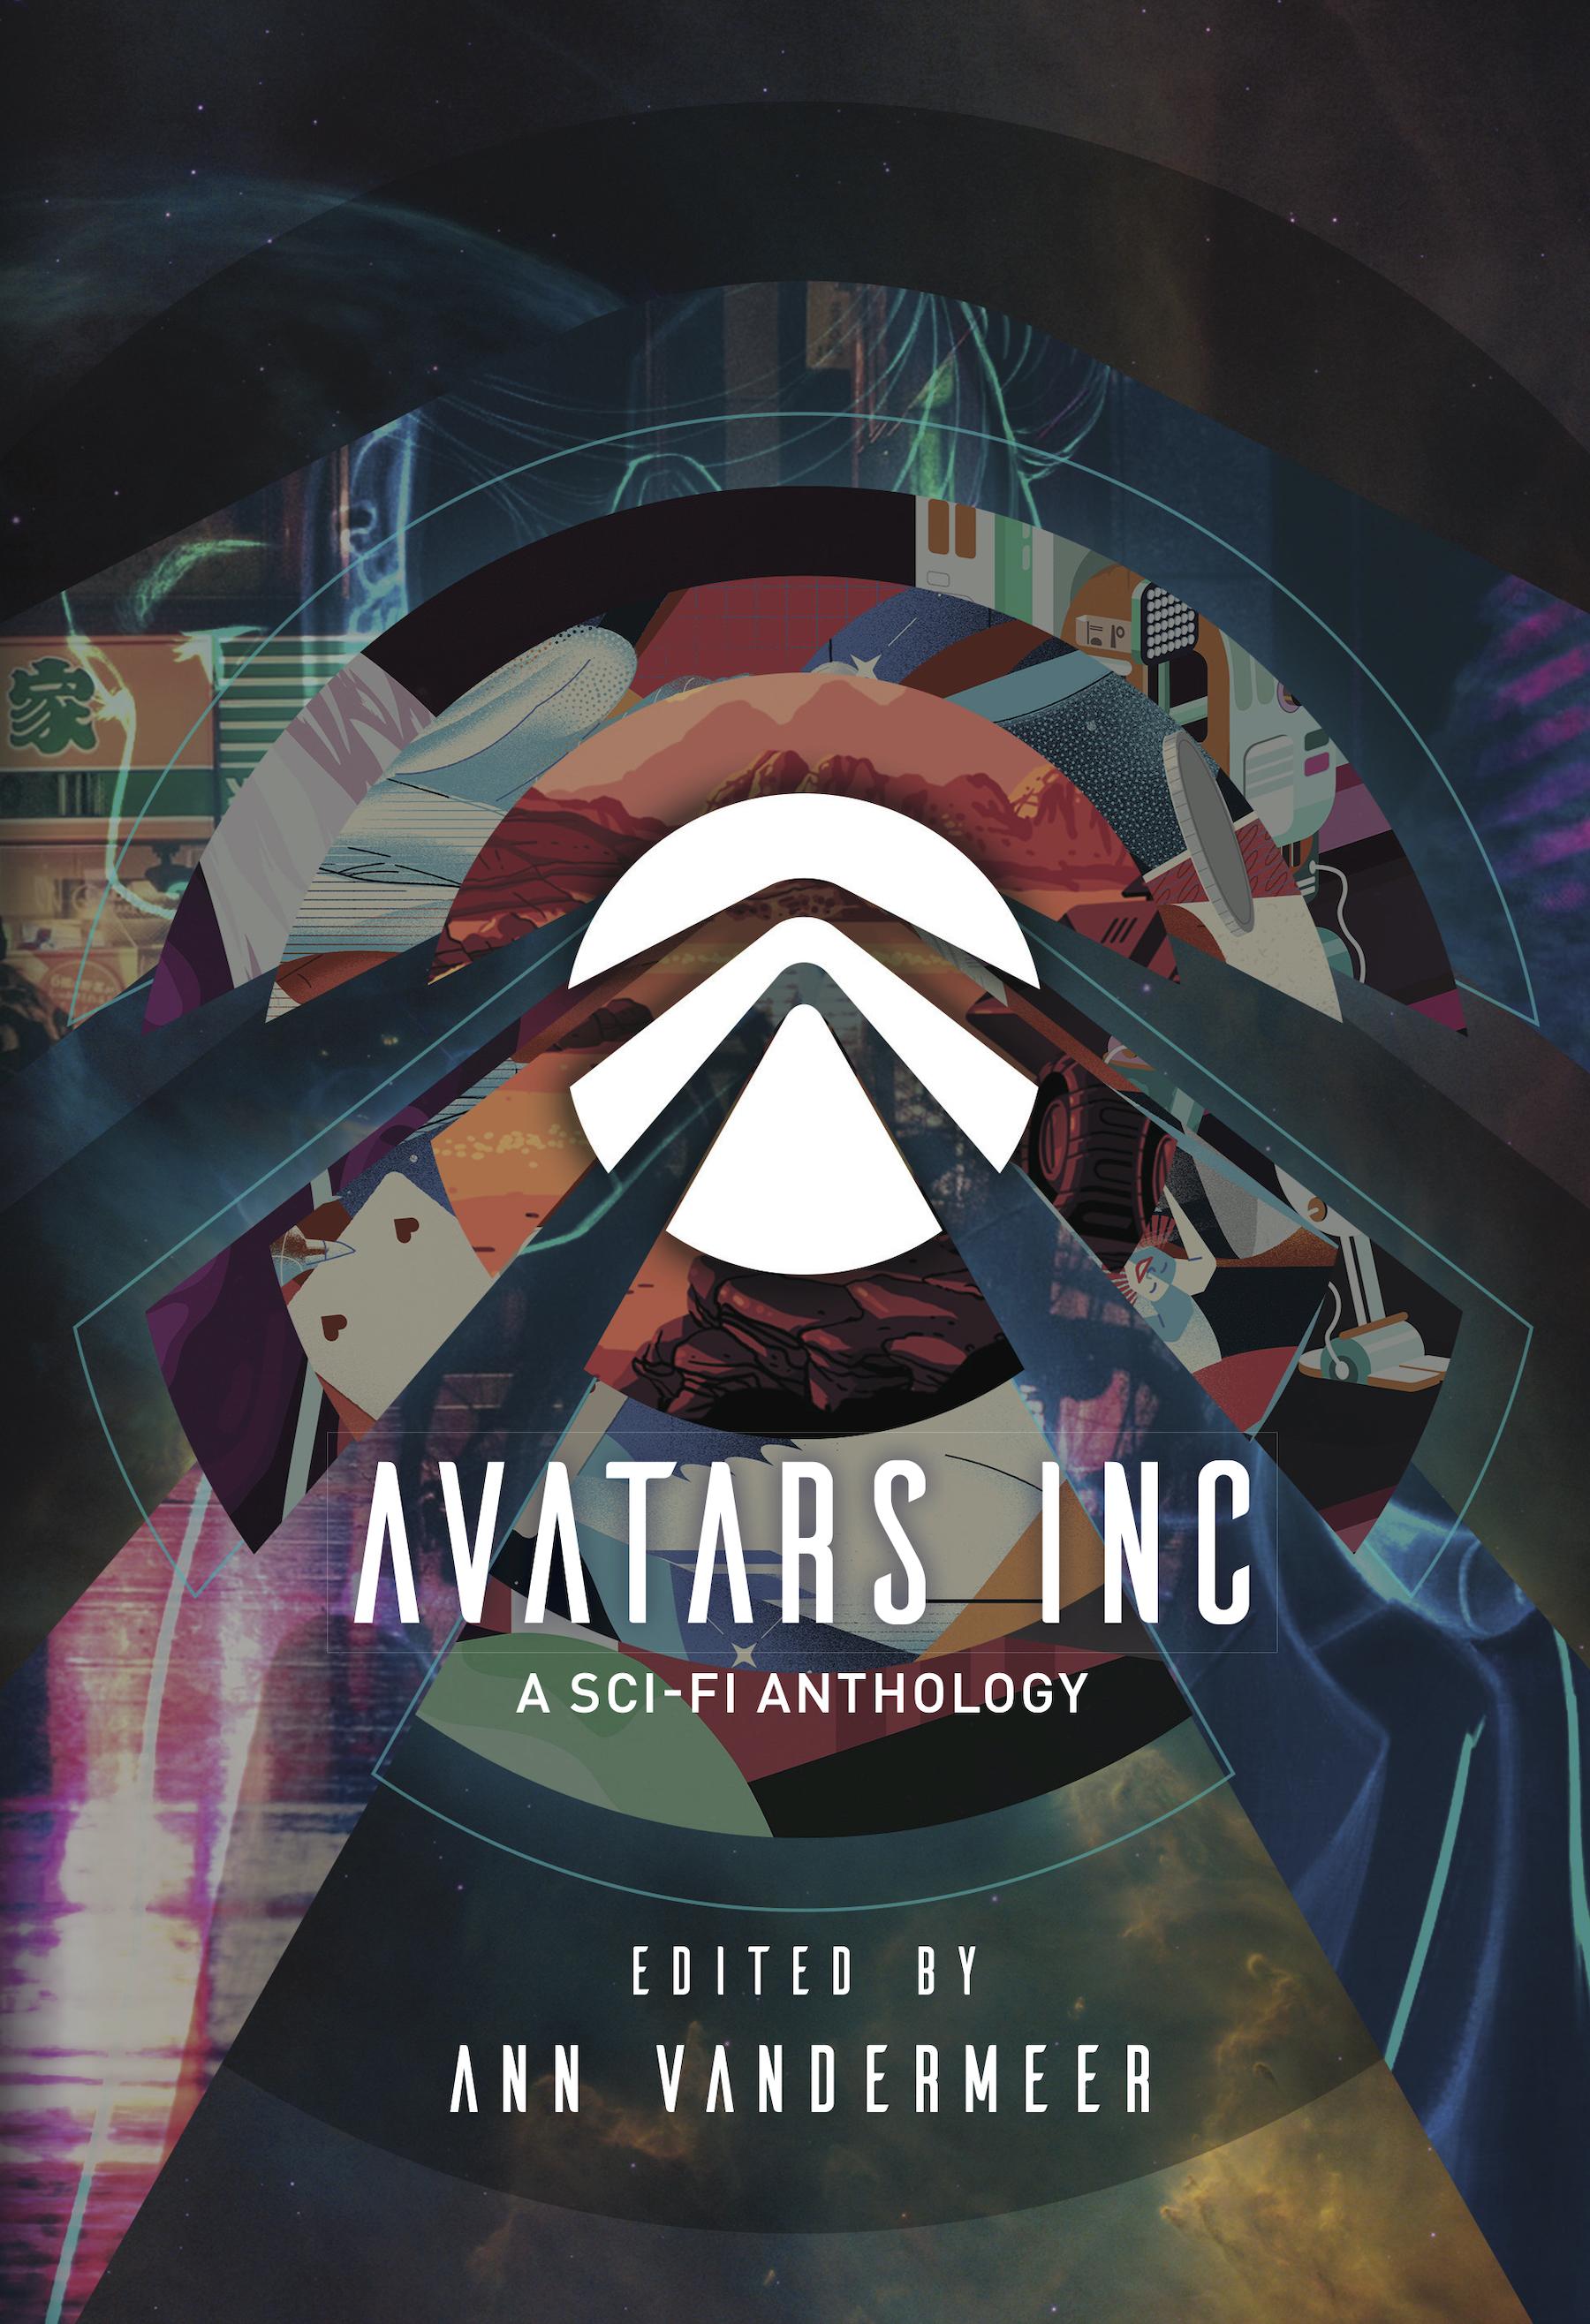 Avatars Inc